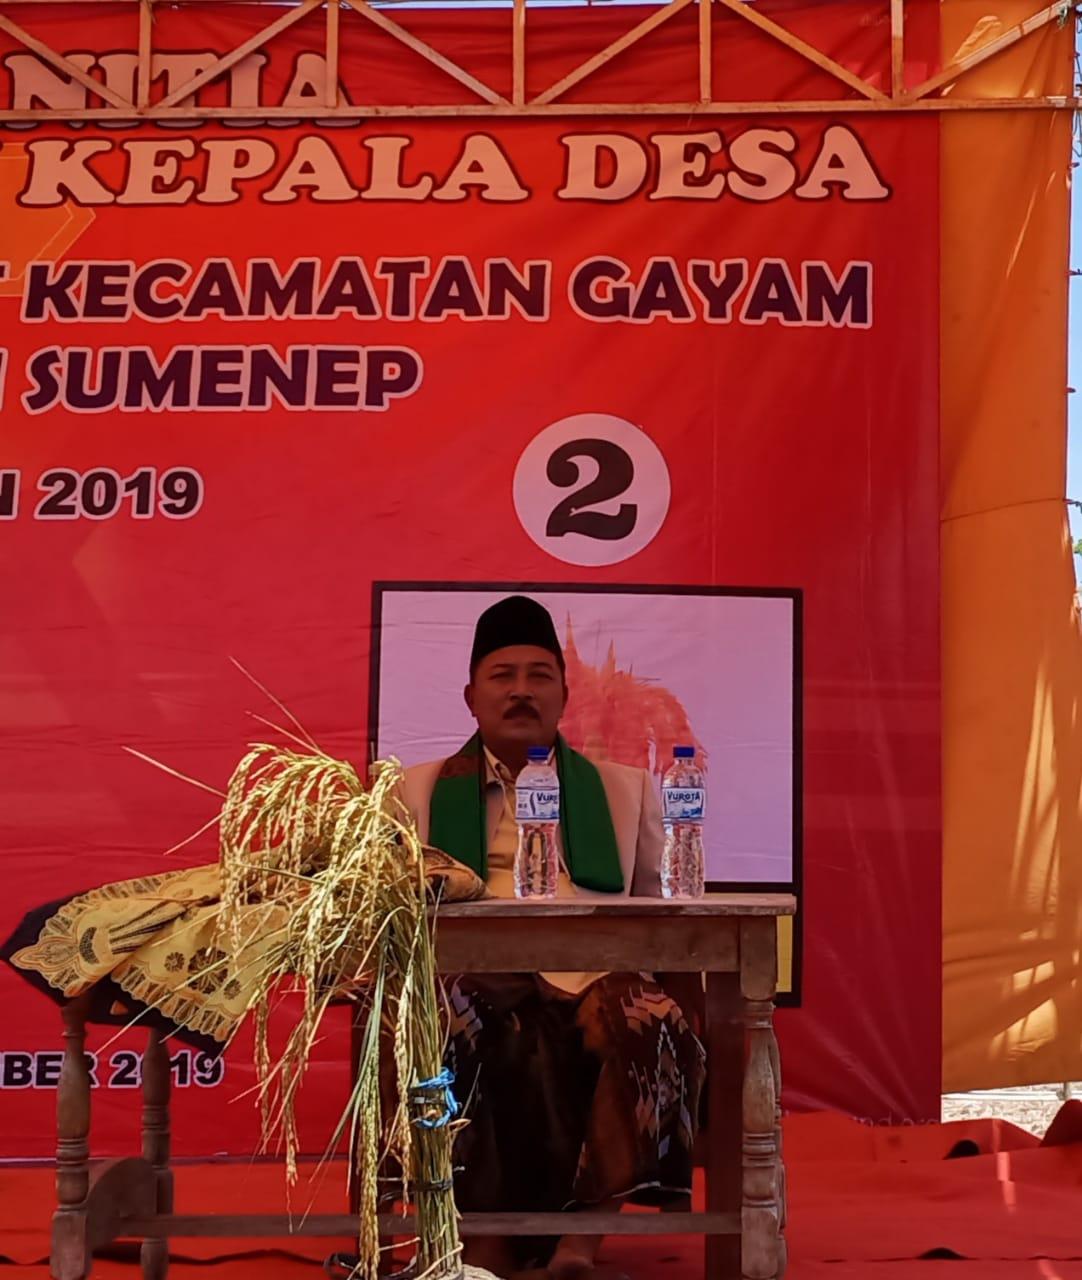 H. Suriyanto  Kembali Pimpin  Desa Gendang Barat Gayam Sapudi